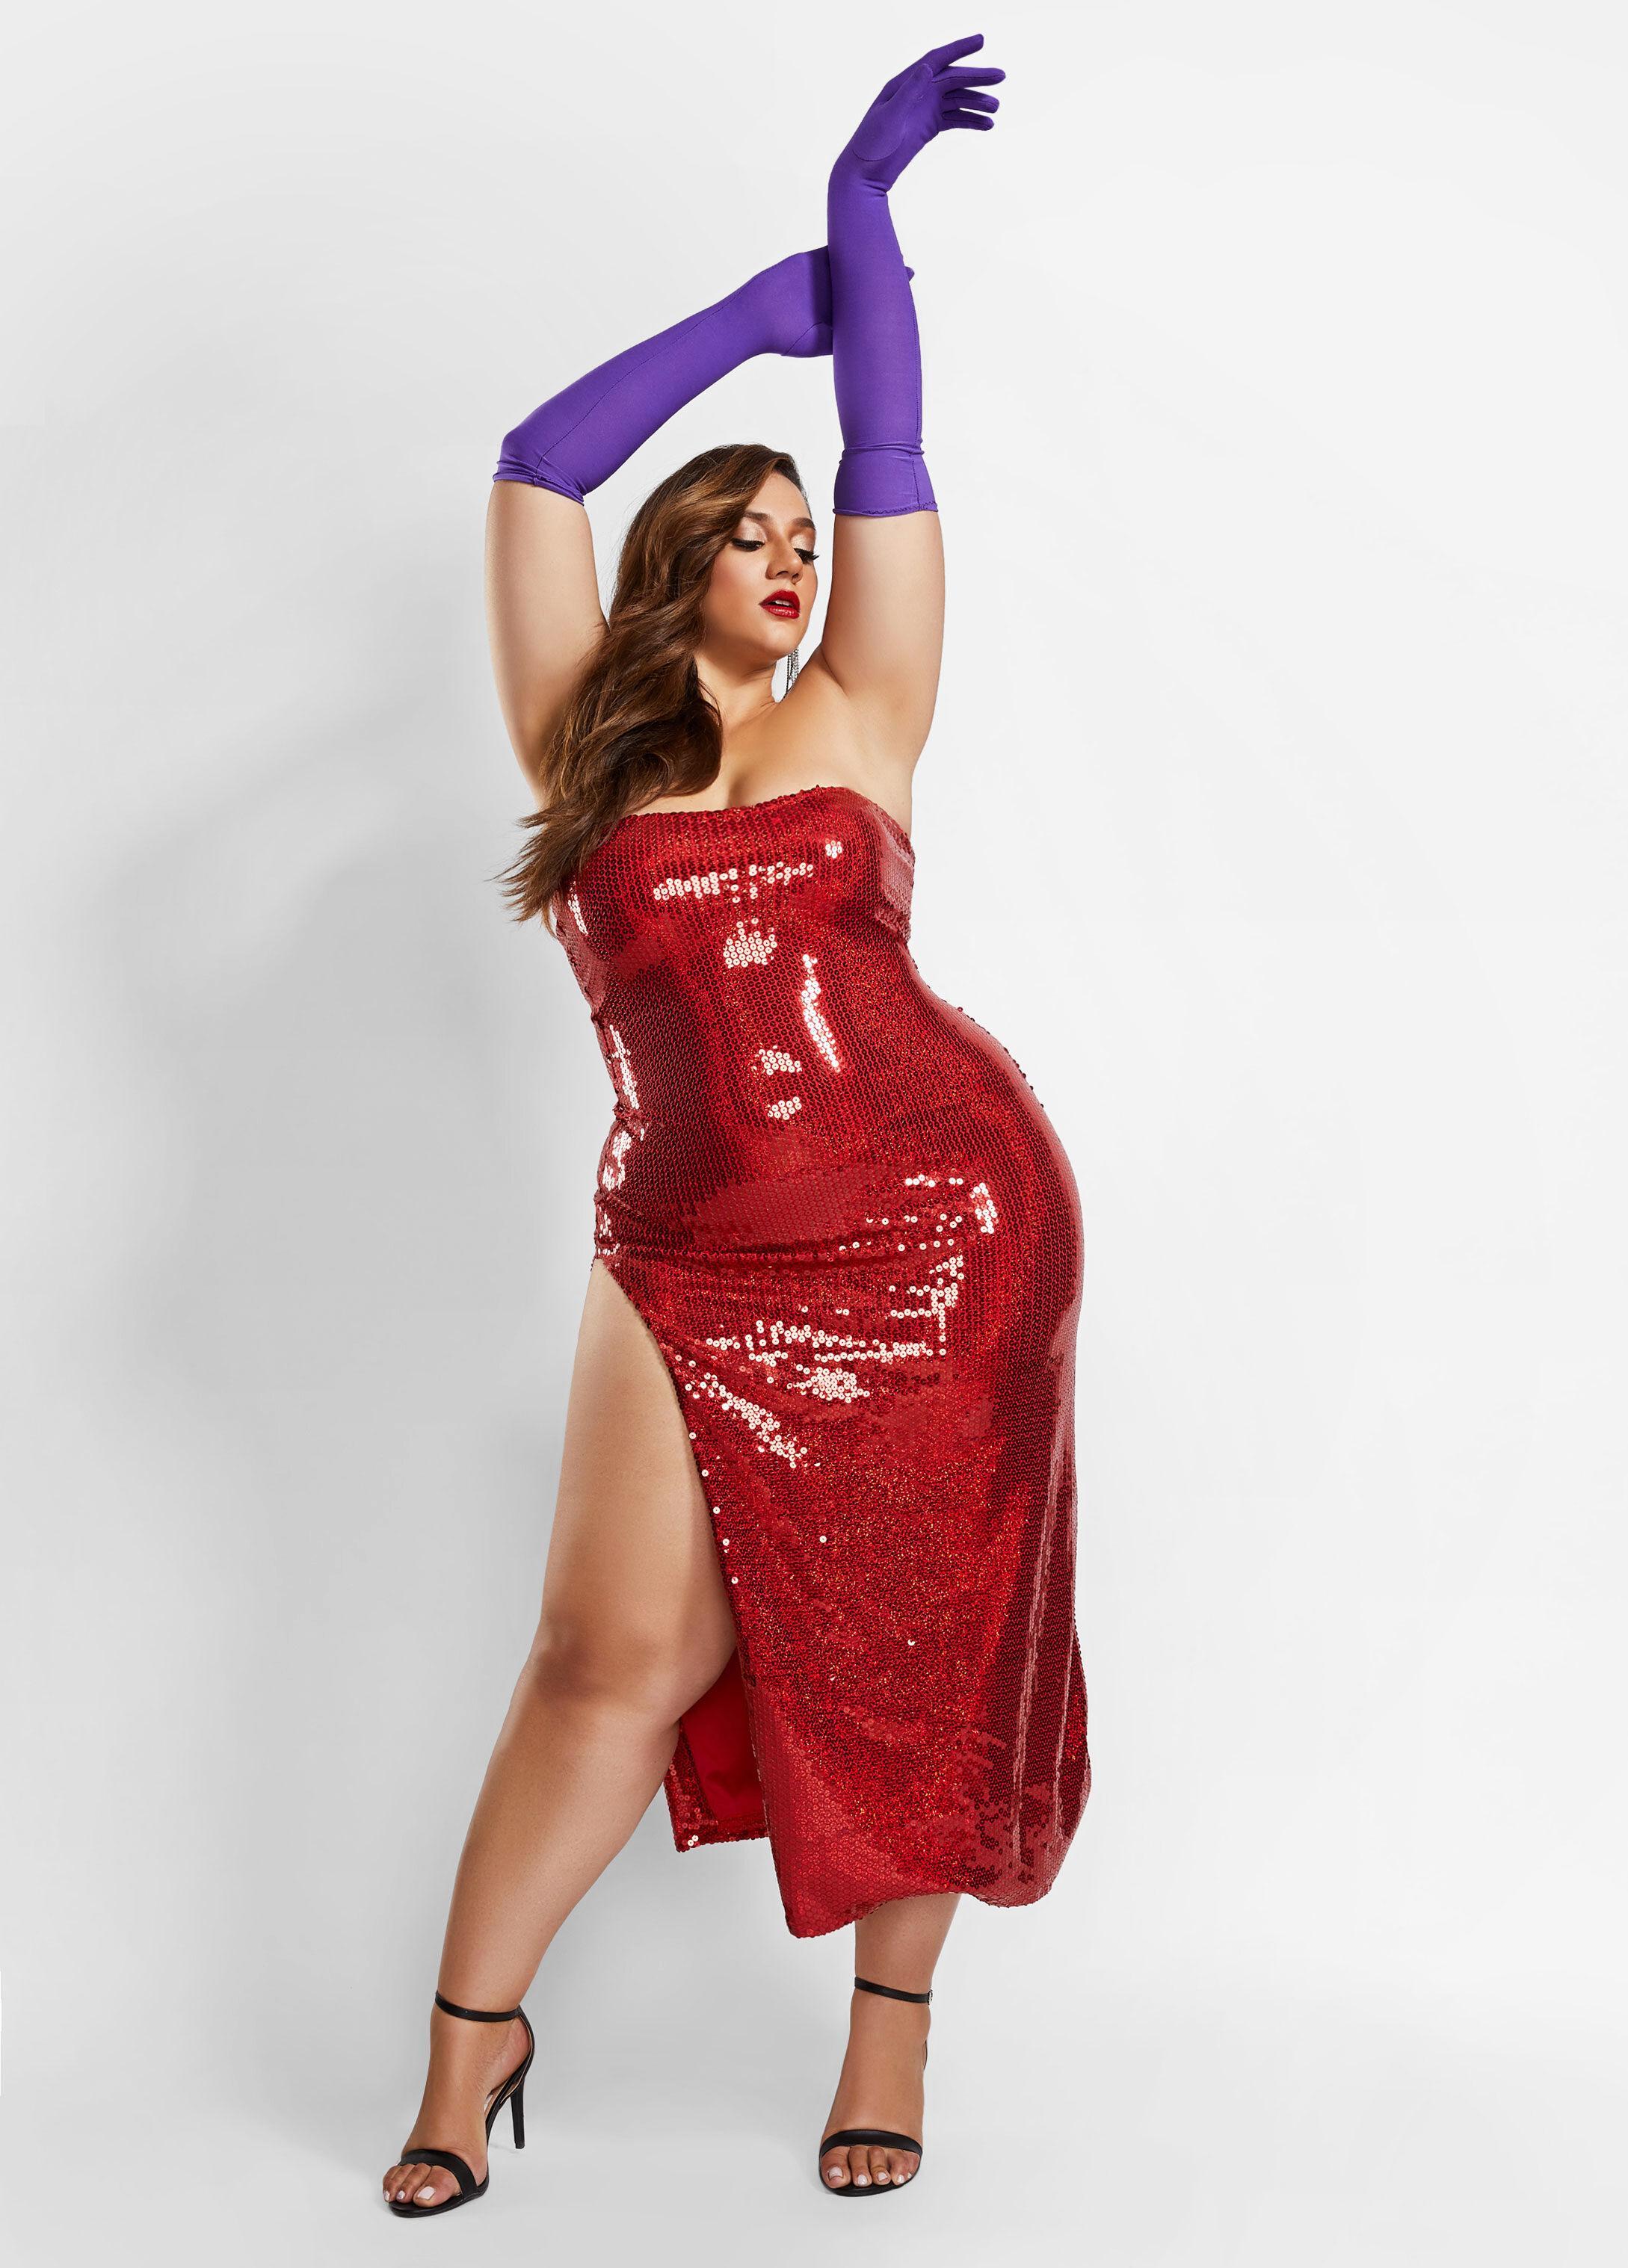 ashley stewart plus size jessica rabbit halloween costume